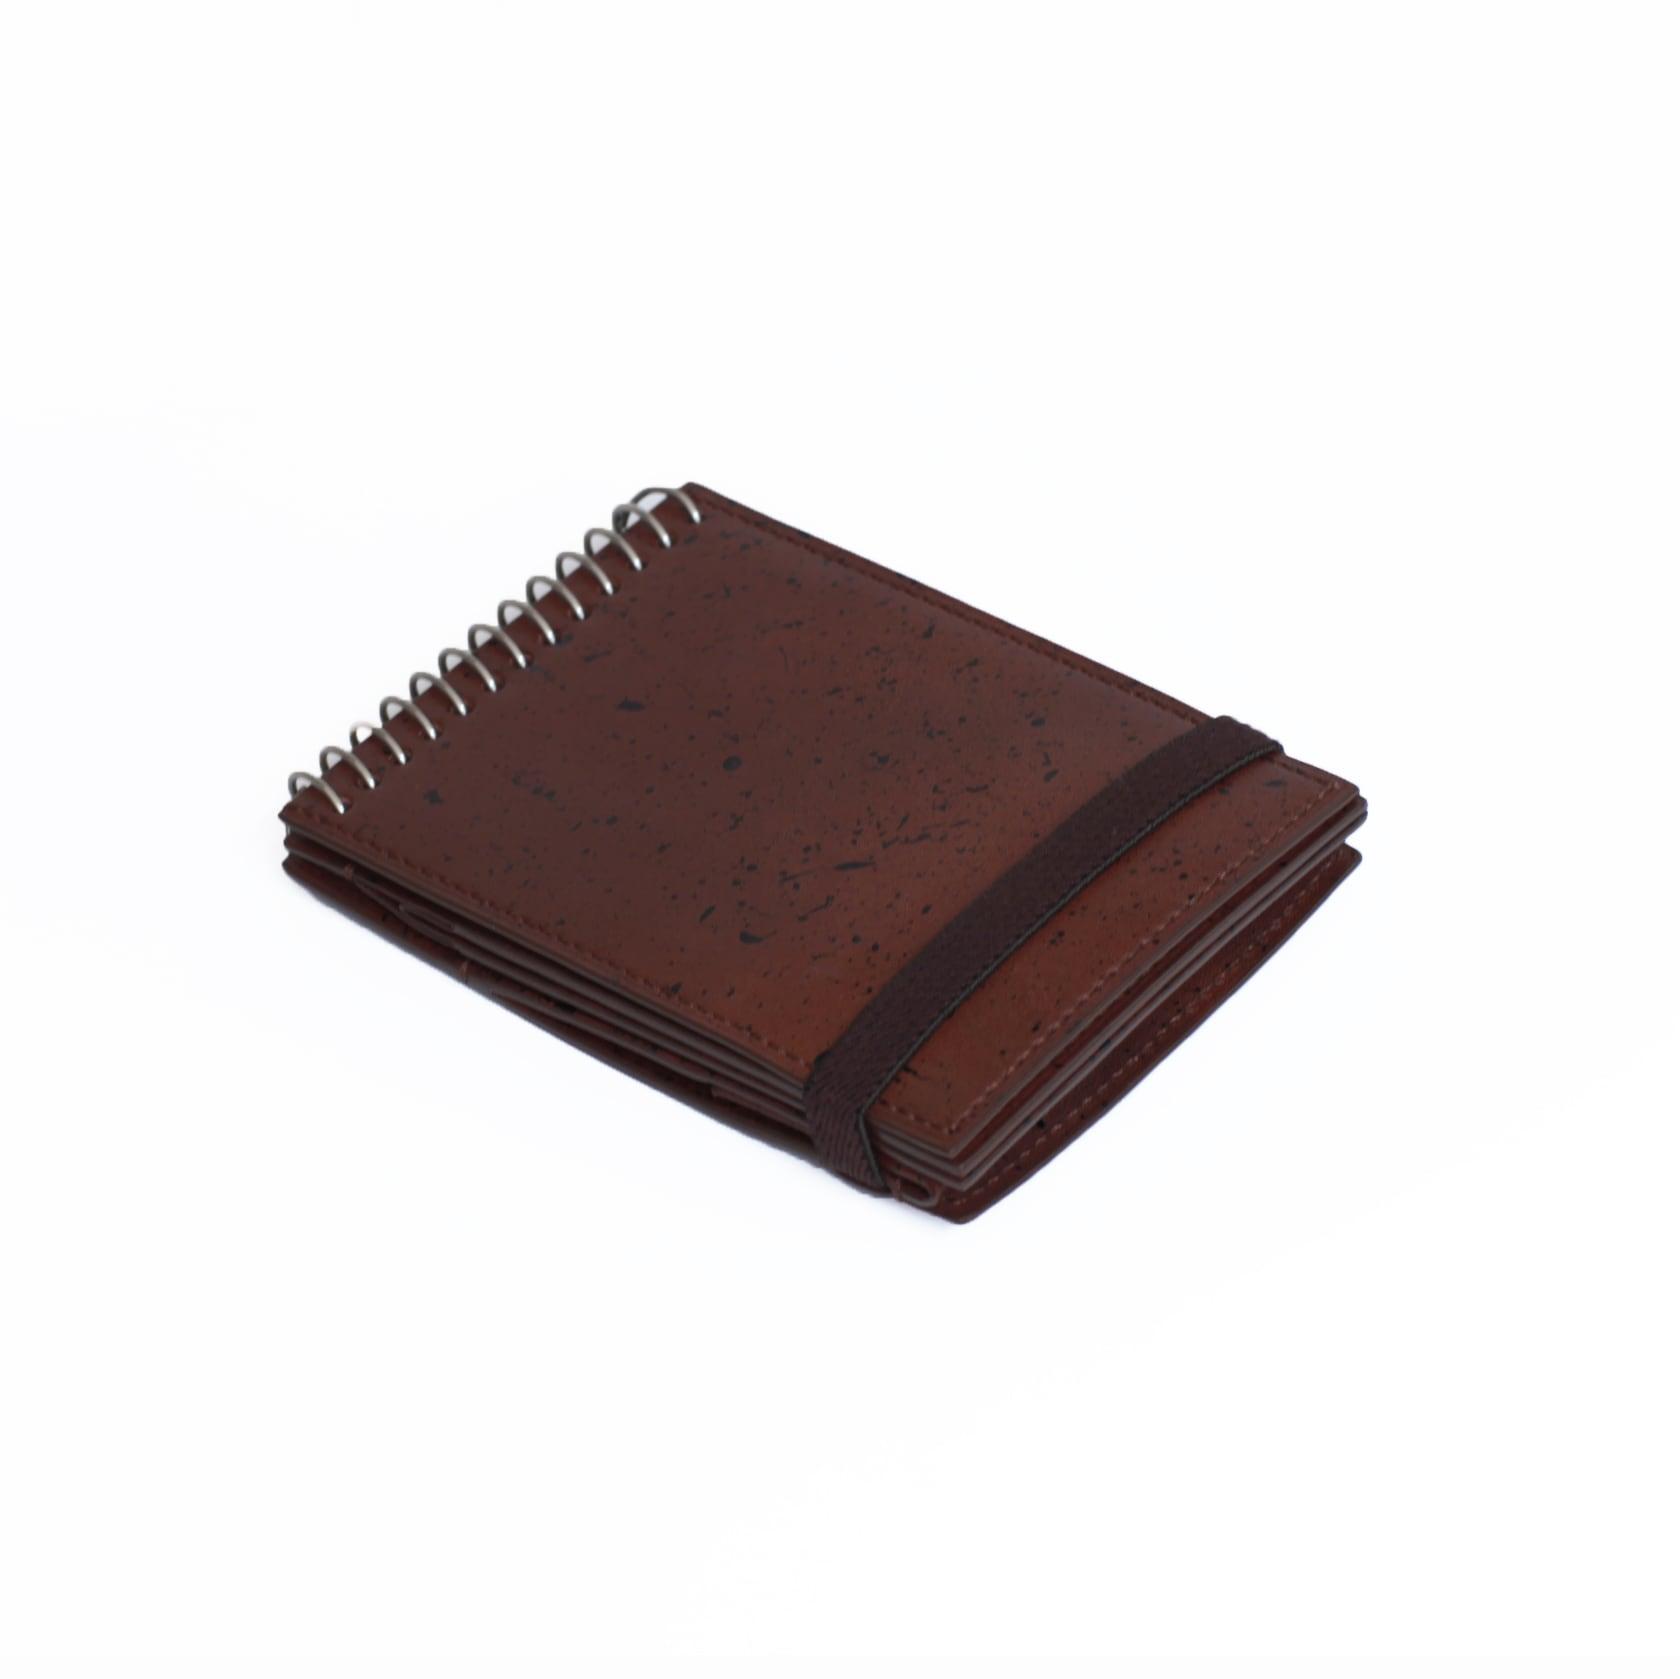 ED ROBERT JUDSON (エド・ロバート・ジャドソン) MEMO (メモ) メモ帳型 2つ折り財布 【ブラウン】